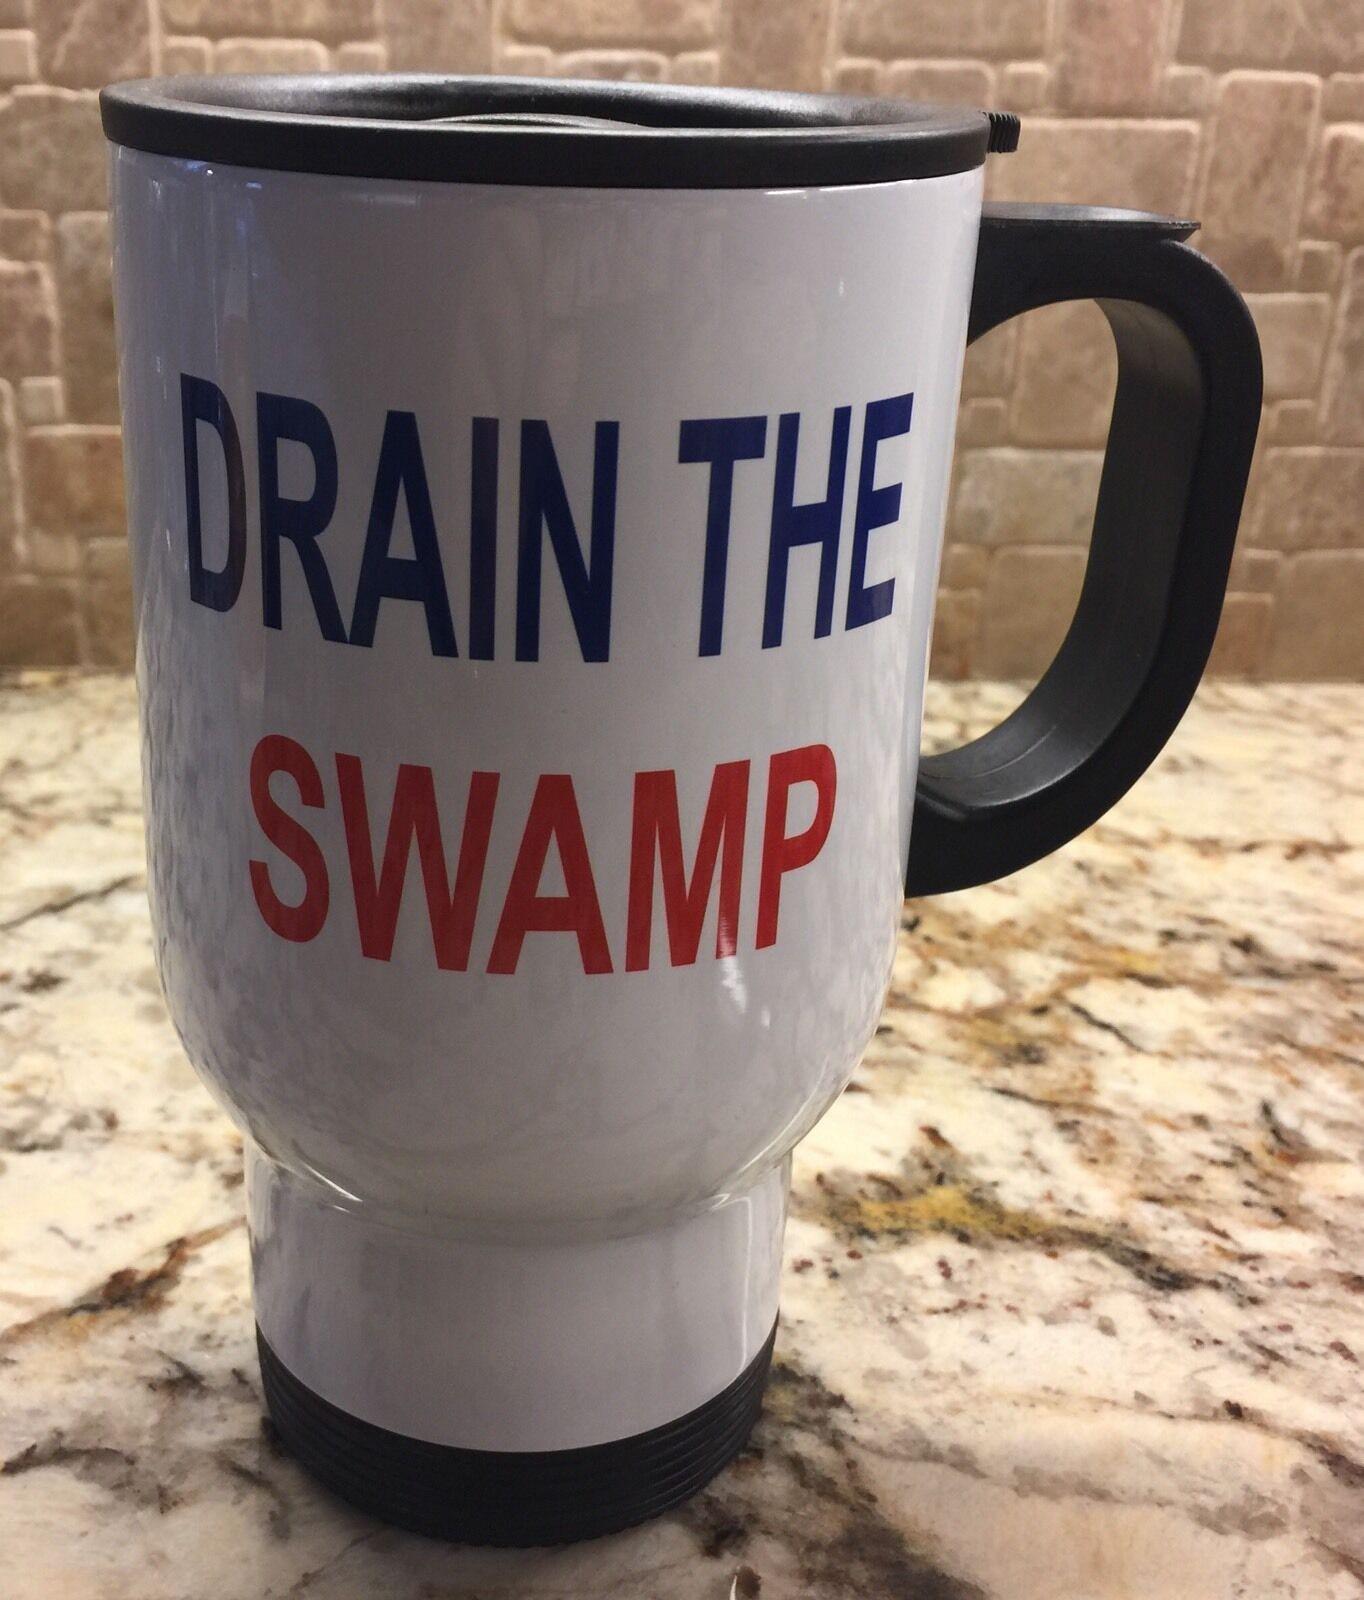 Drain The Swamp 20oz Tumbler Trump Tumbler Travel Mug Trump Mug Drain The Swamp Trump 20 Oz Tumbler Trump Tumblers Fathers Day Gift